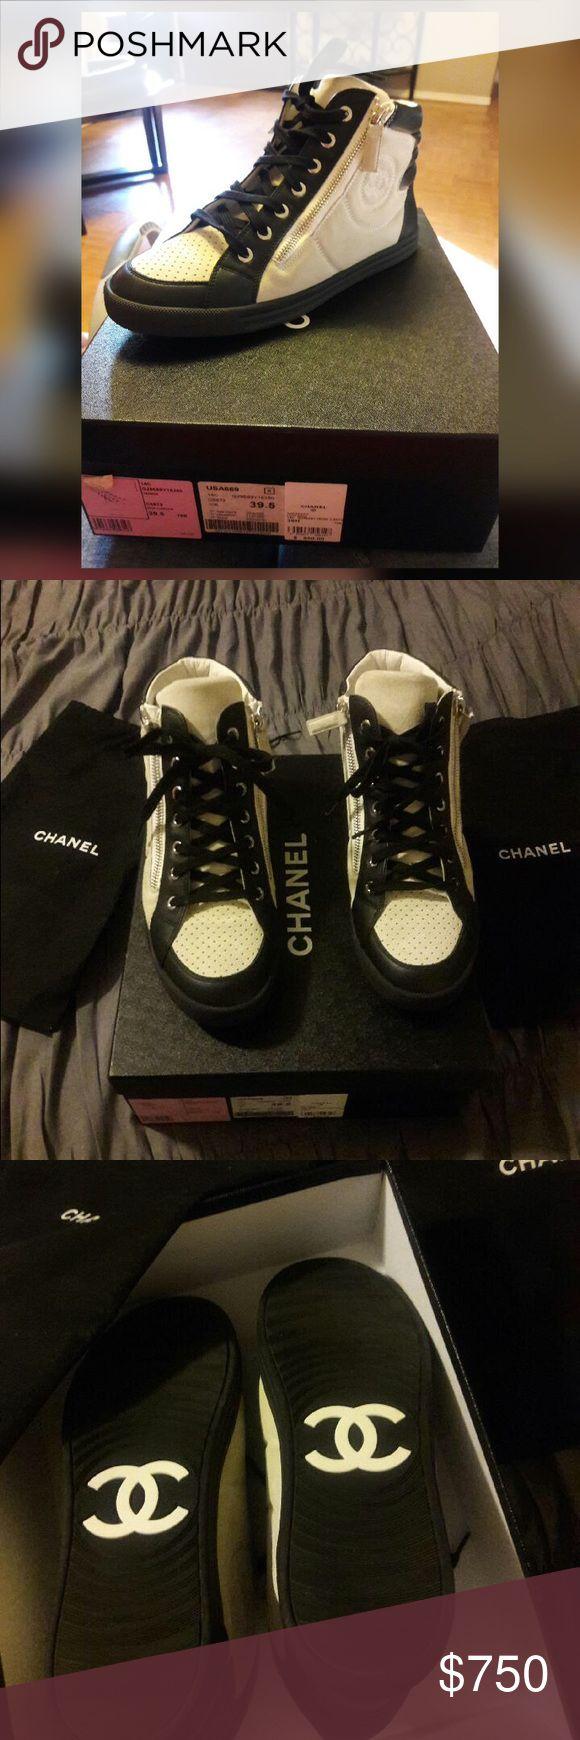 Chanel Tennis🎉SALE 12/3/16🎉 Authentic NWT Black & White Chanel High Top Tennis Shoes CHANEL Shoes Athletic Shoes